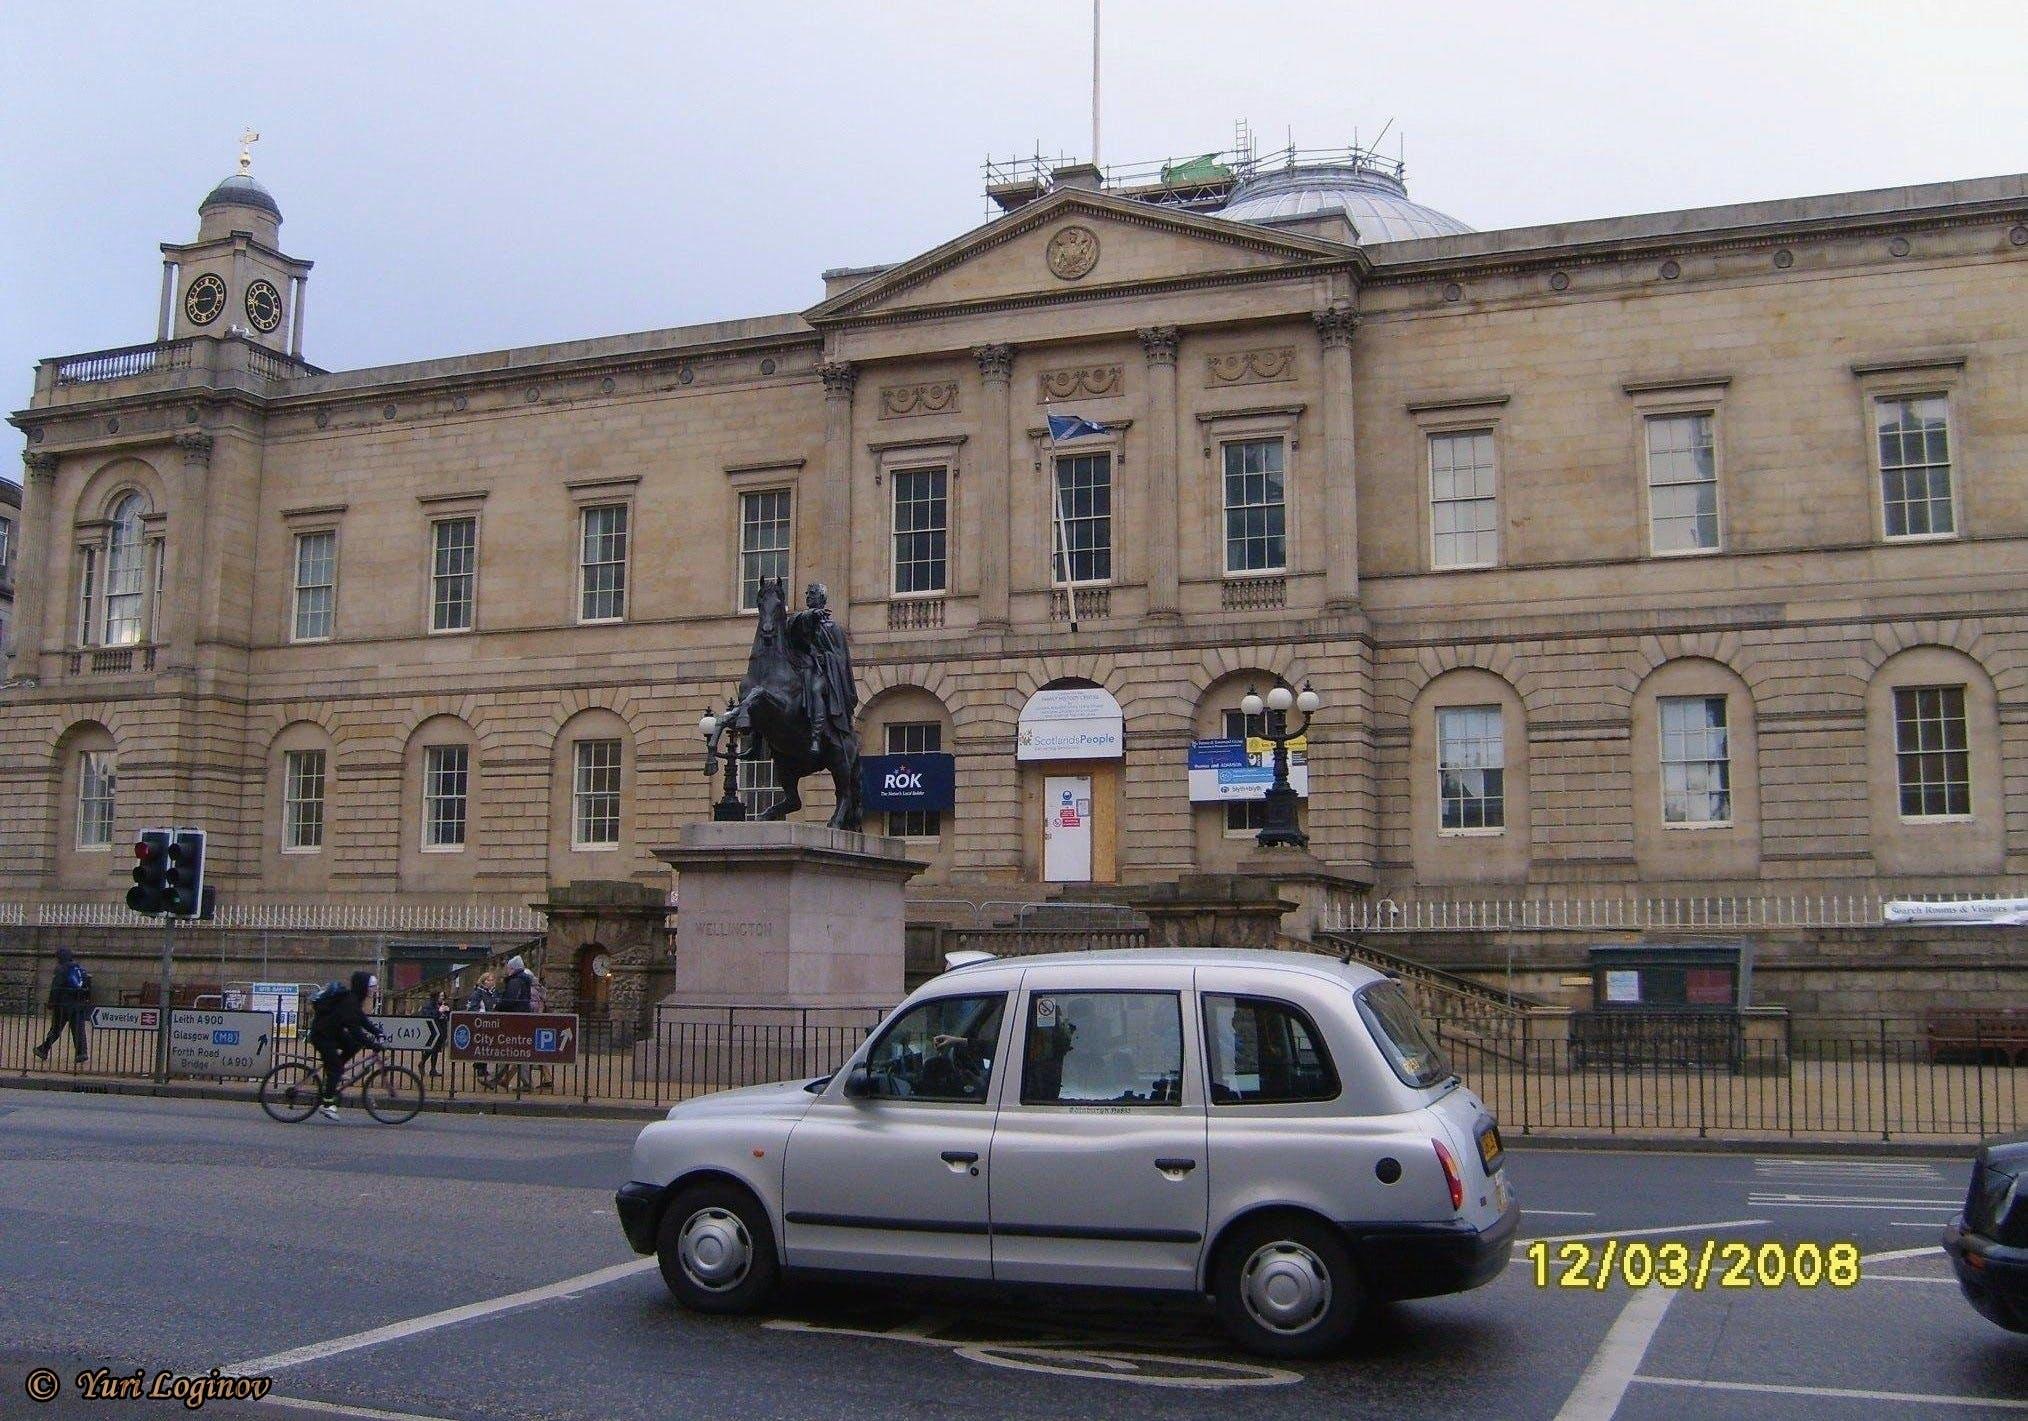 Free stock photo of scotland, edinburgh, united kingdom, Wellington